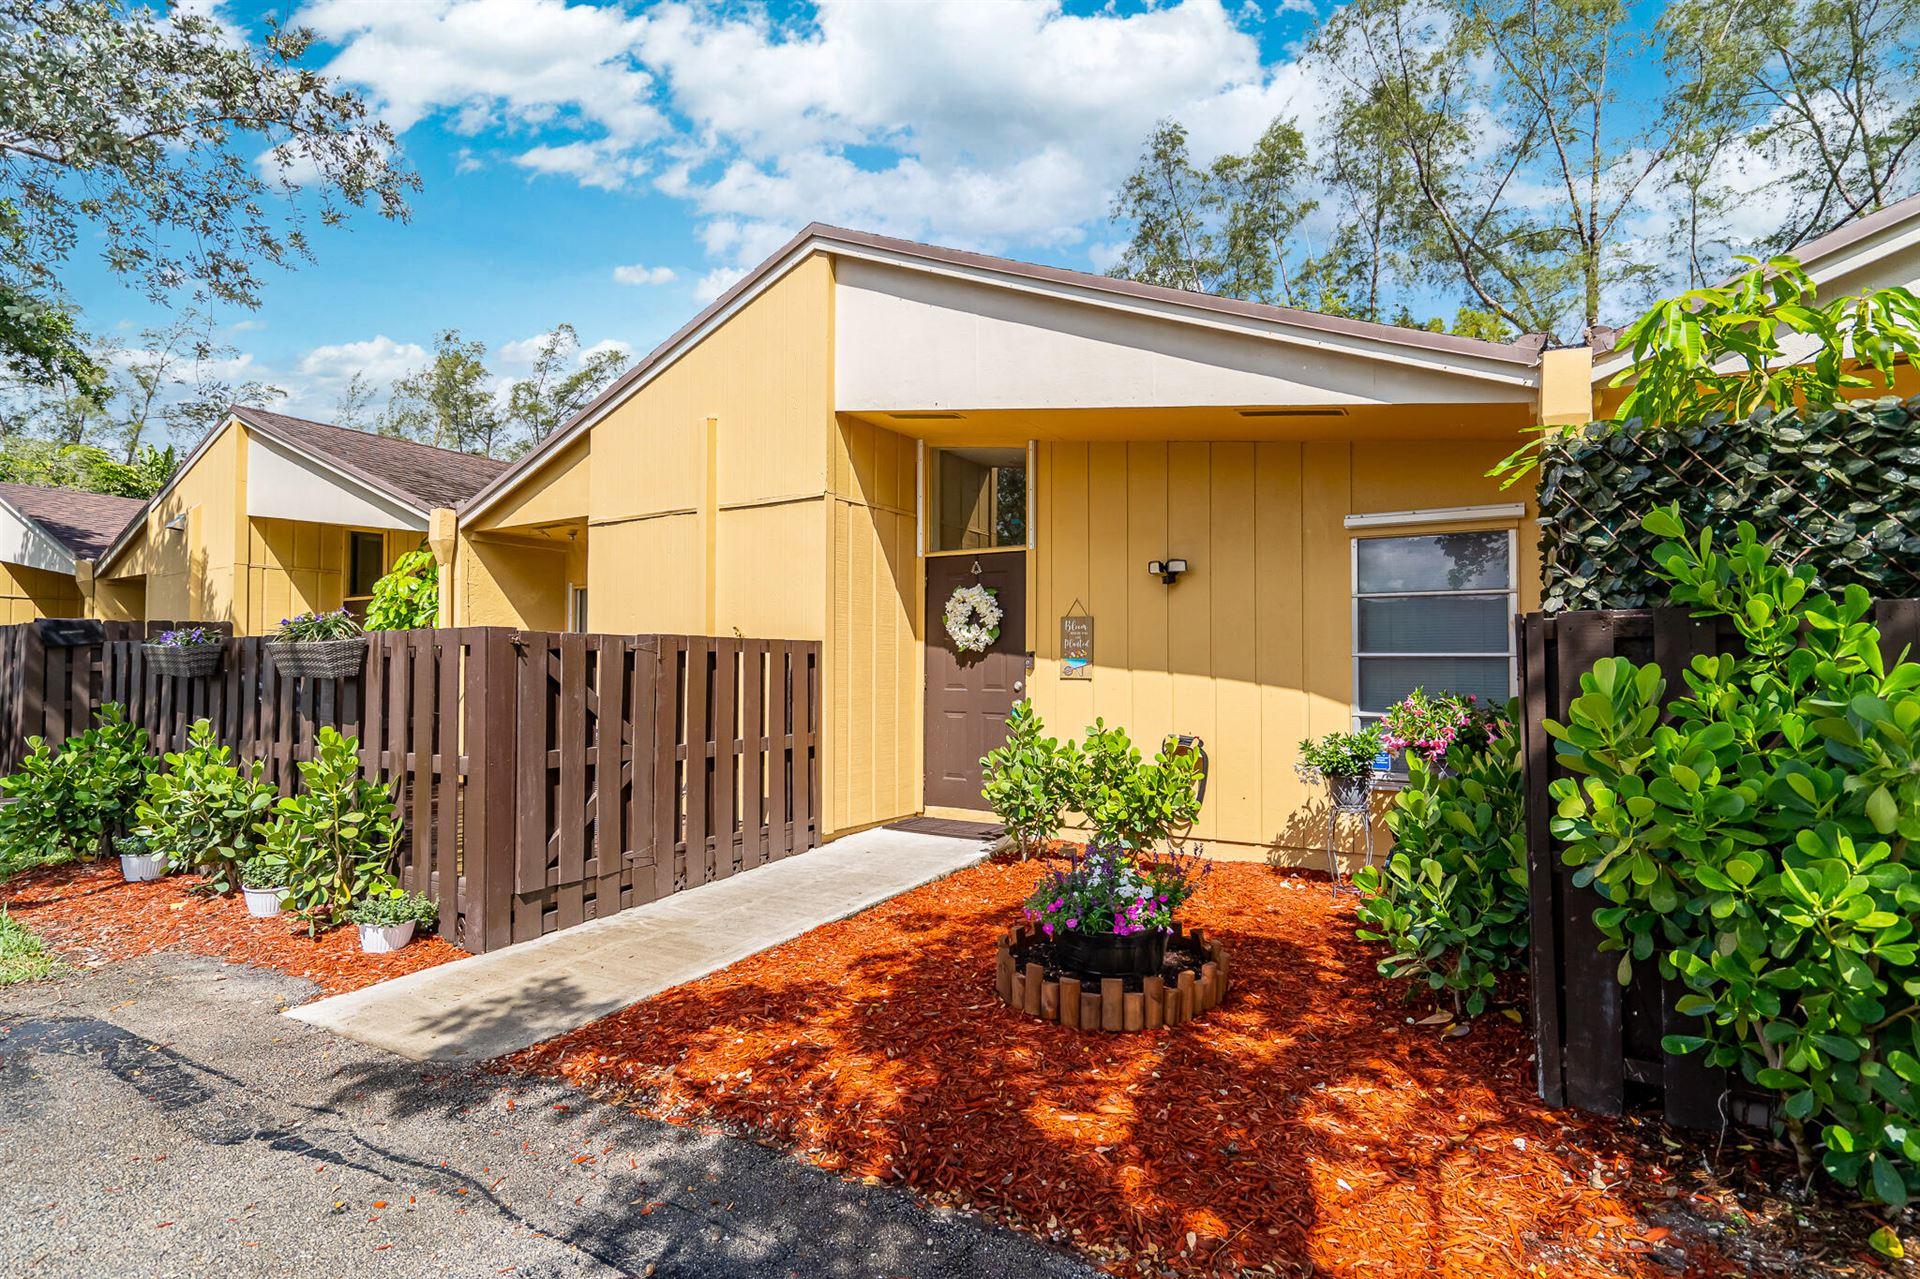 11633 Orange Blossom Lane, Boca Raton, FL 33428 - MLS#: RX-10722547